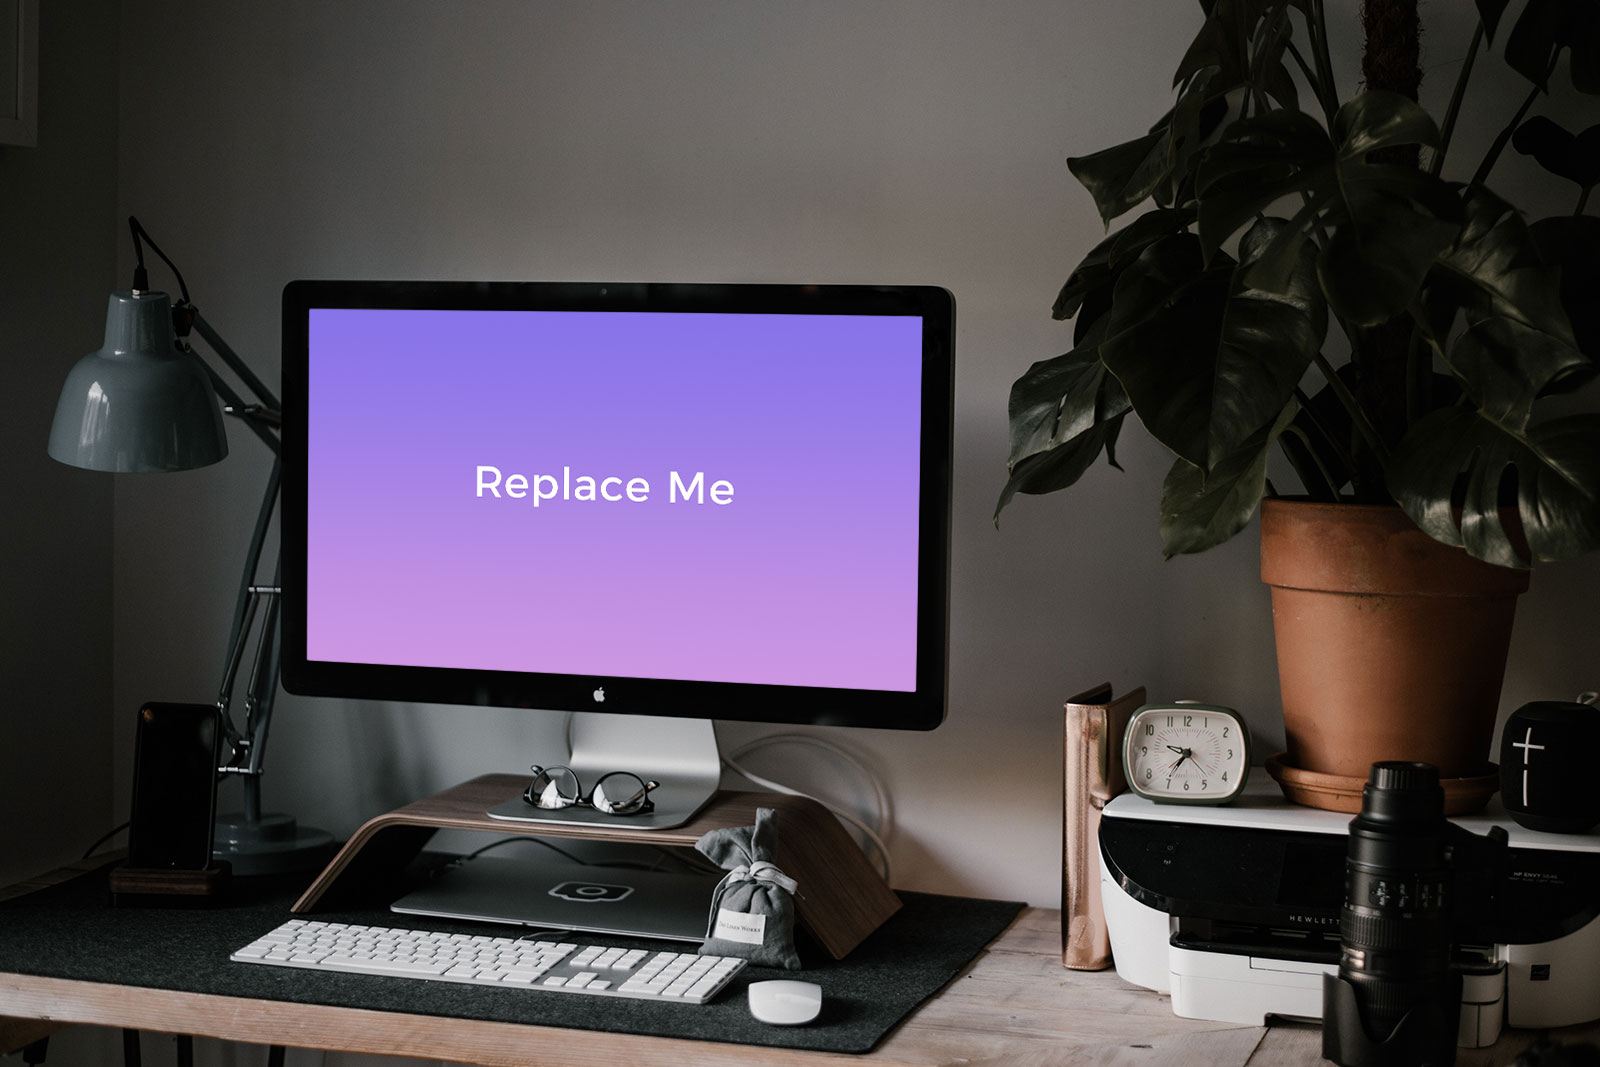 Free Workspace Imac Pro Mockup Psd Good Mockups